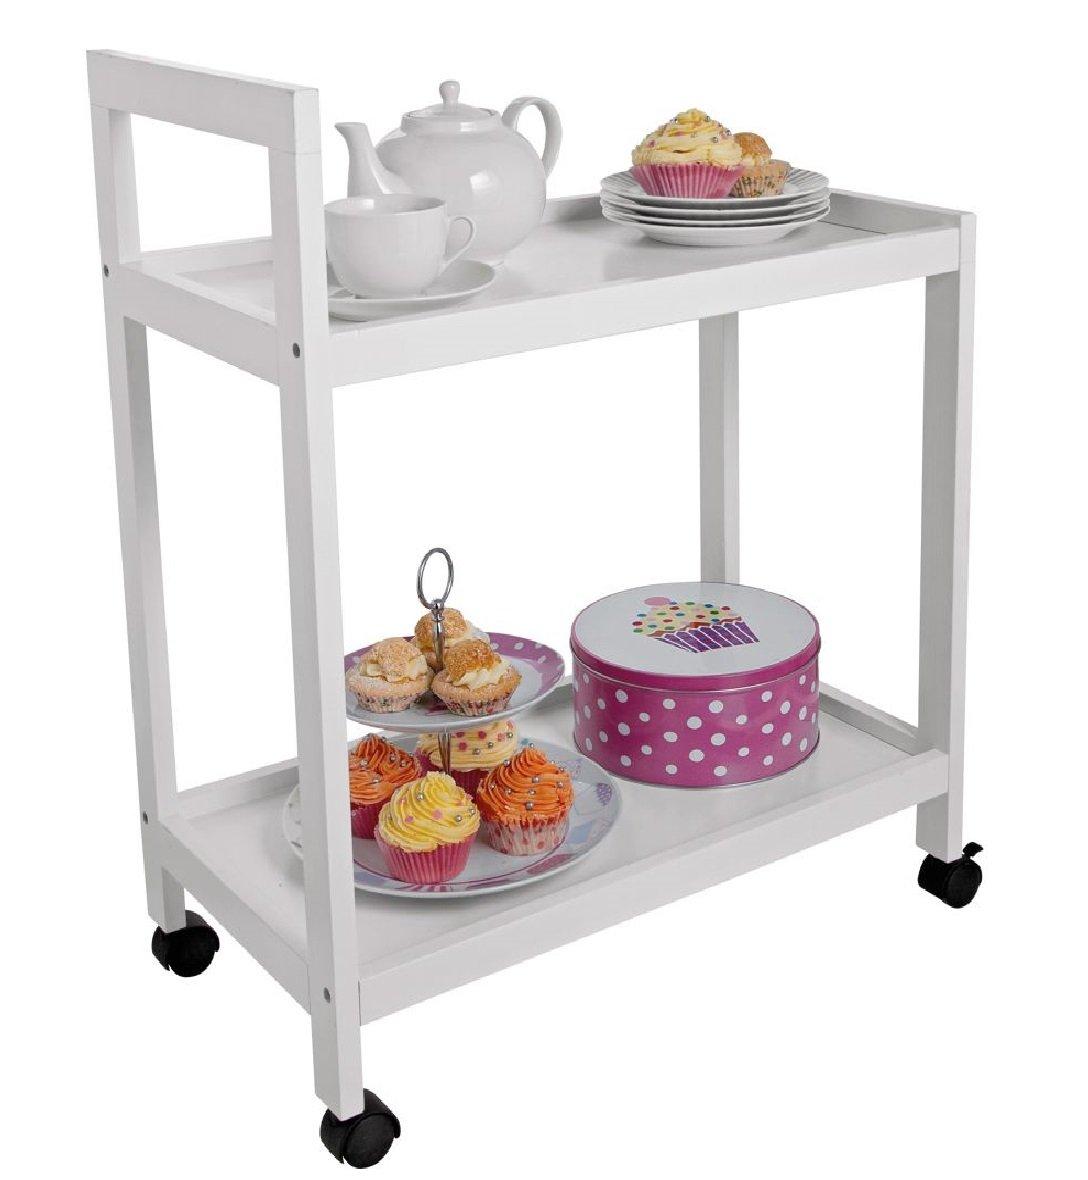 HOME Tea Trolley - White Choicefullbargain